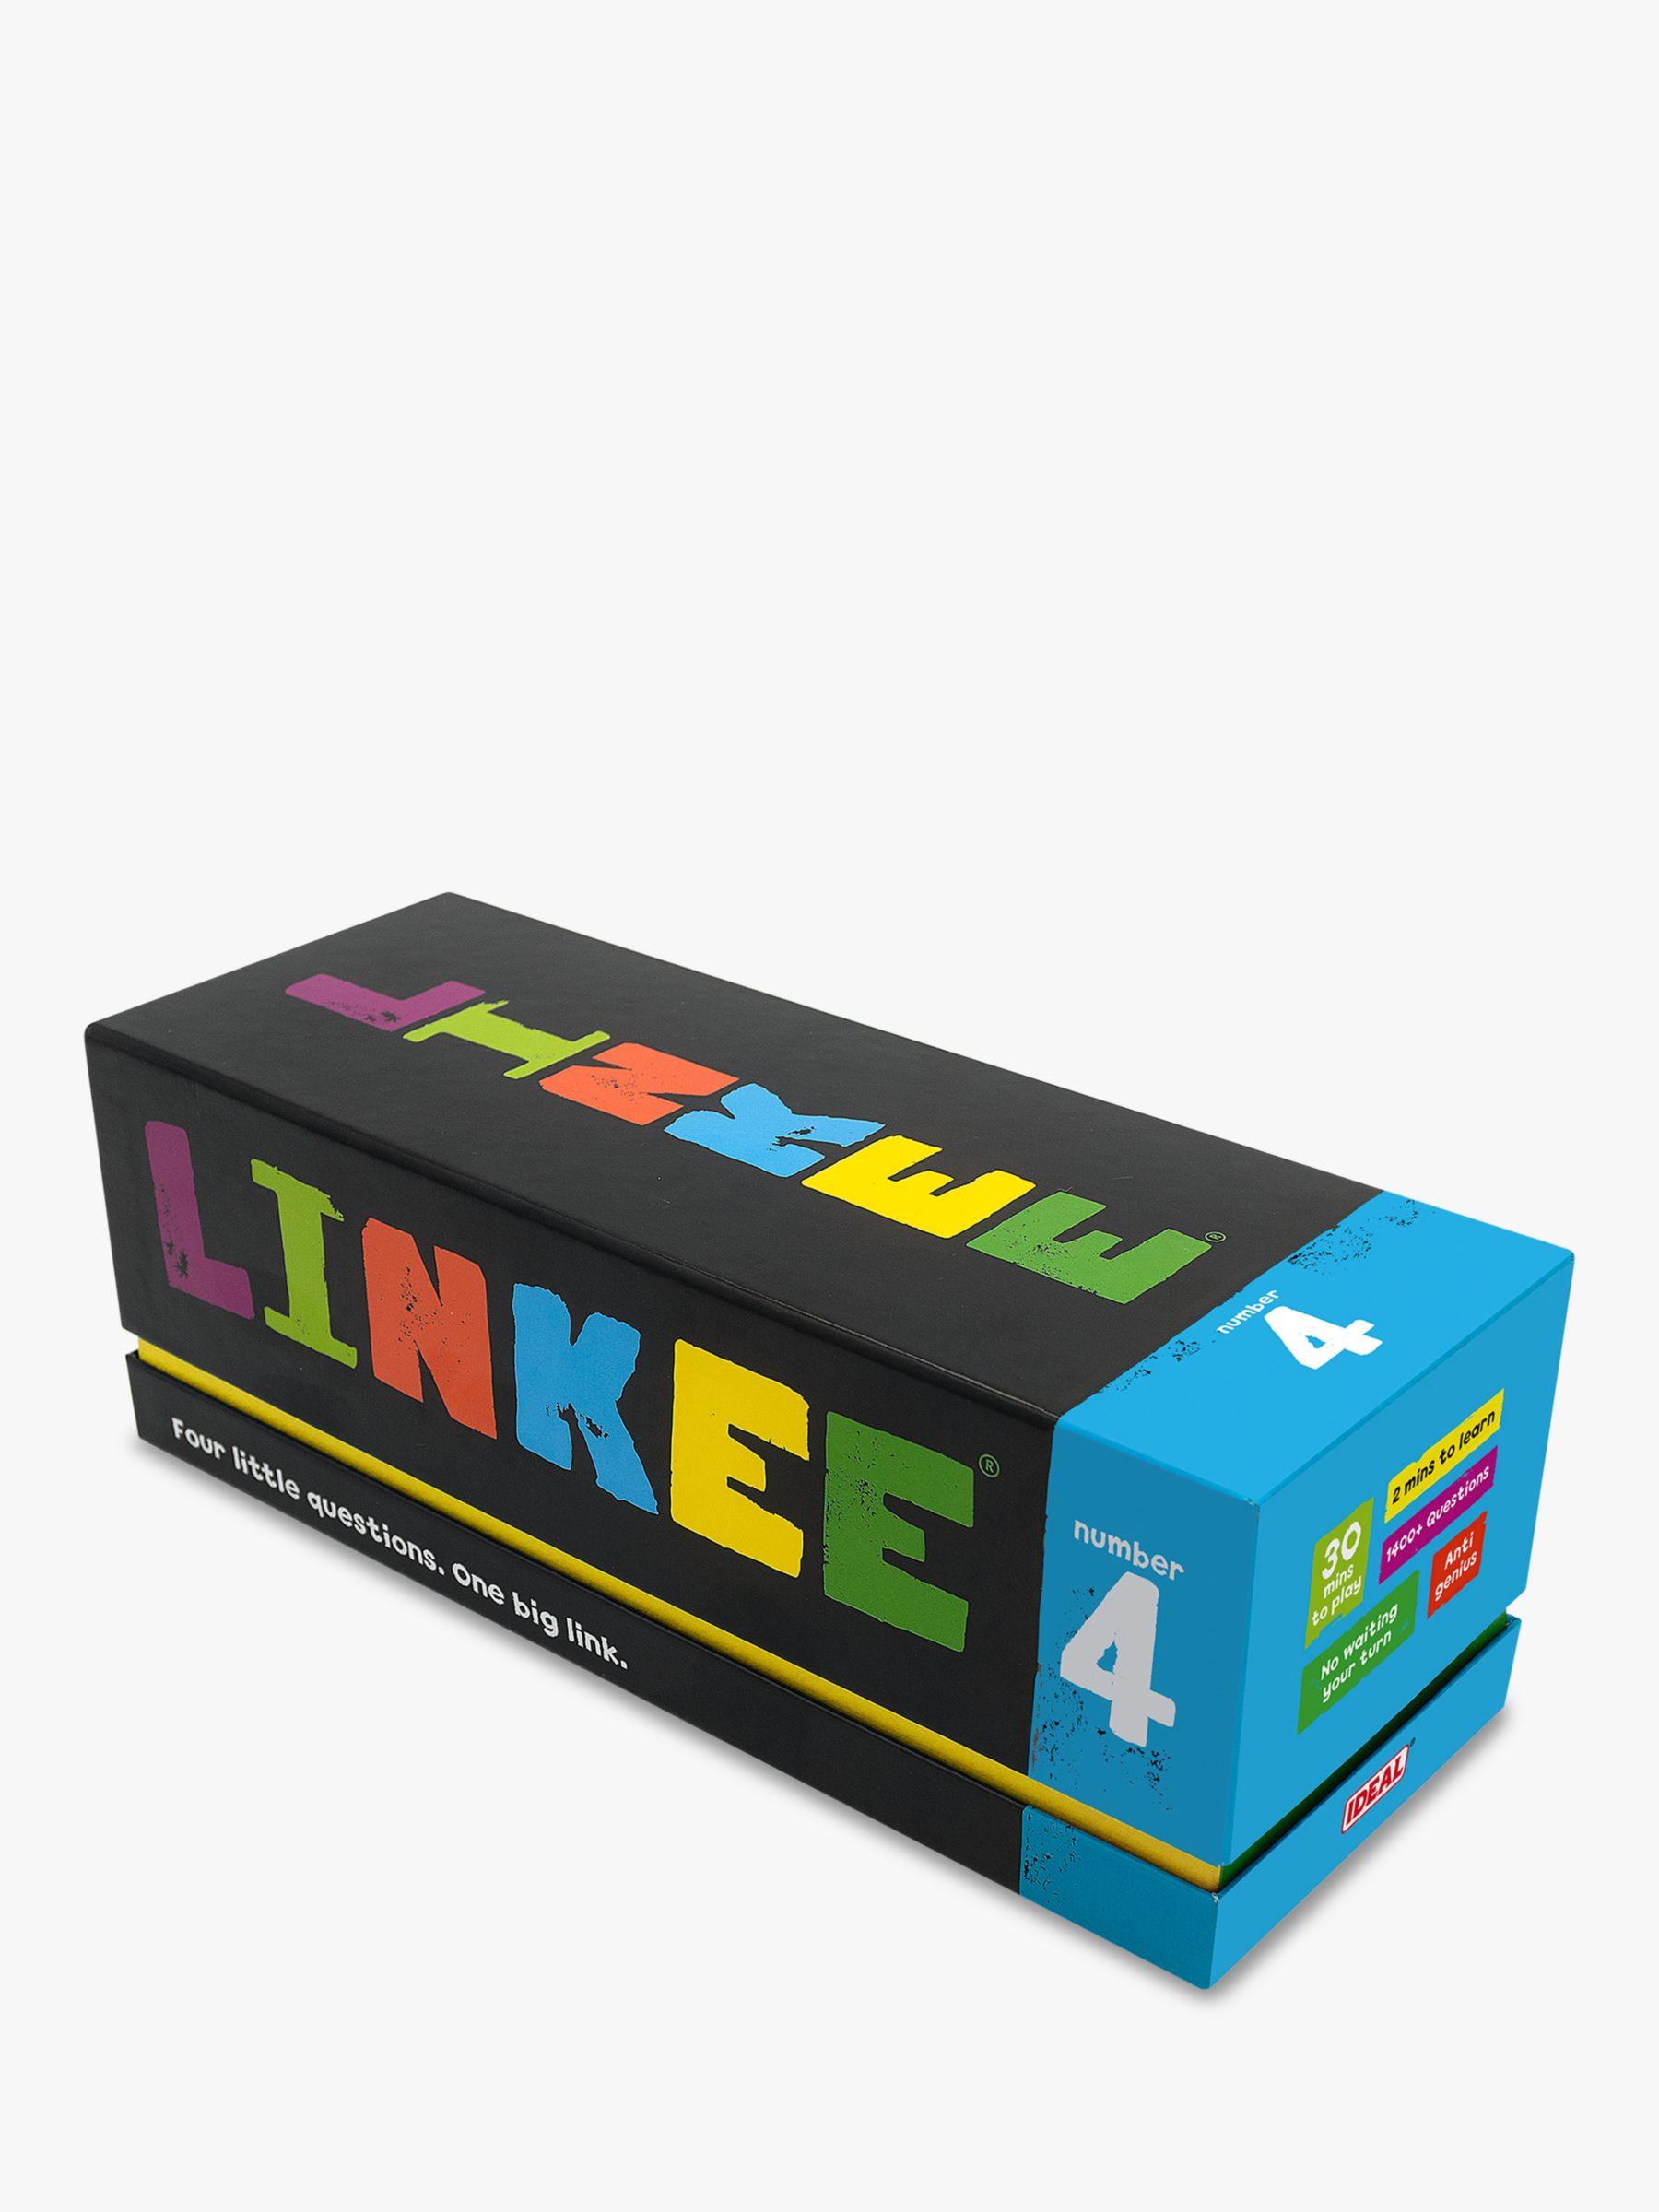 Linkee Linkee Trivia Game, 3rd Edition